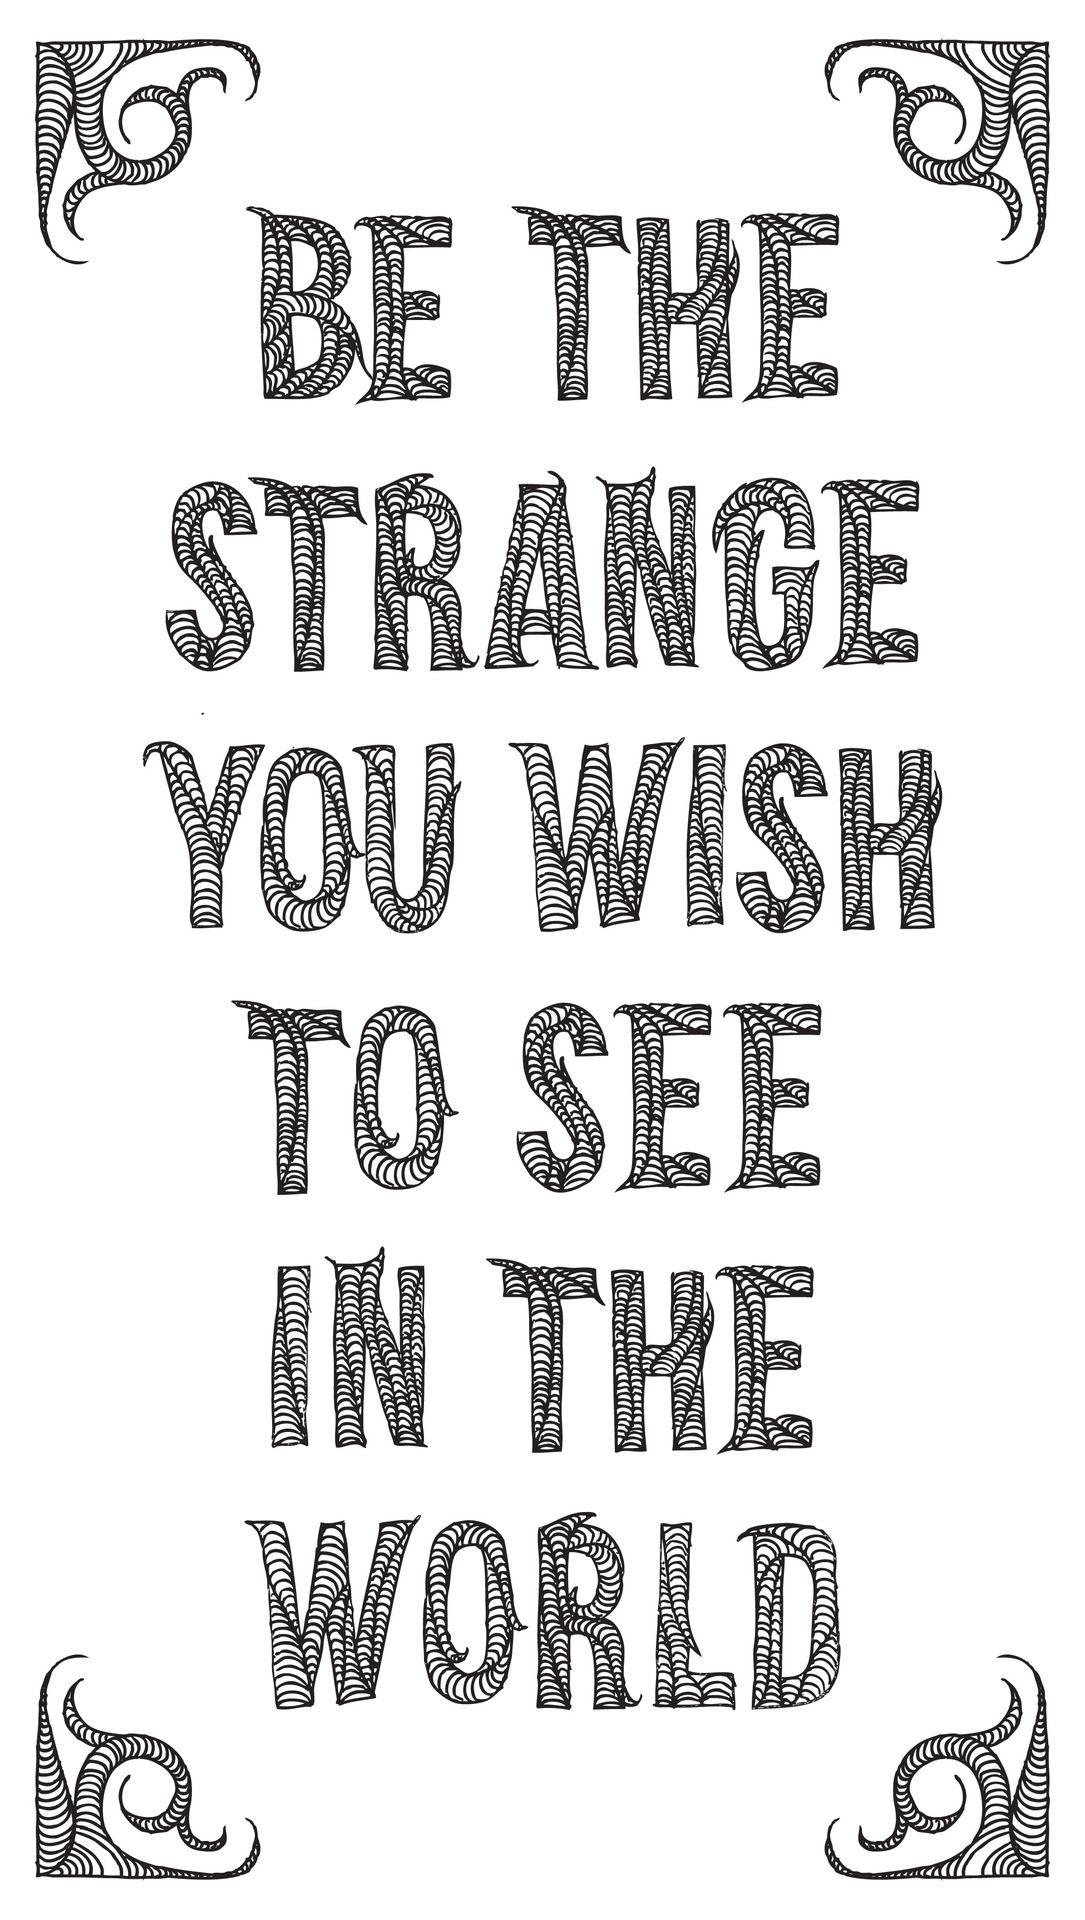 Be the strange